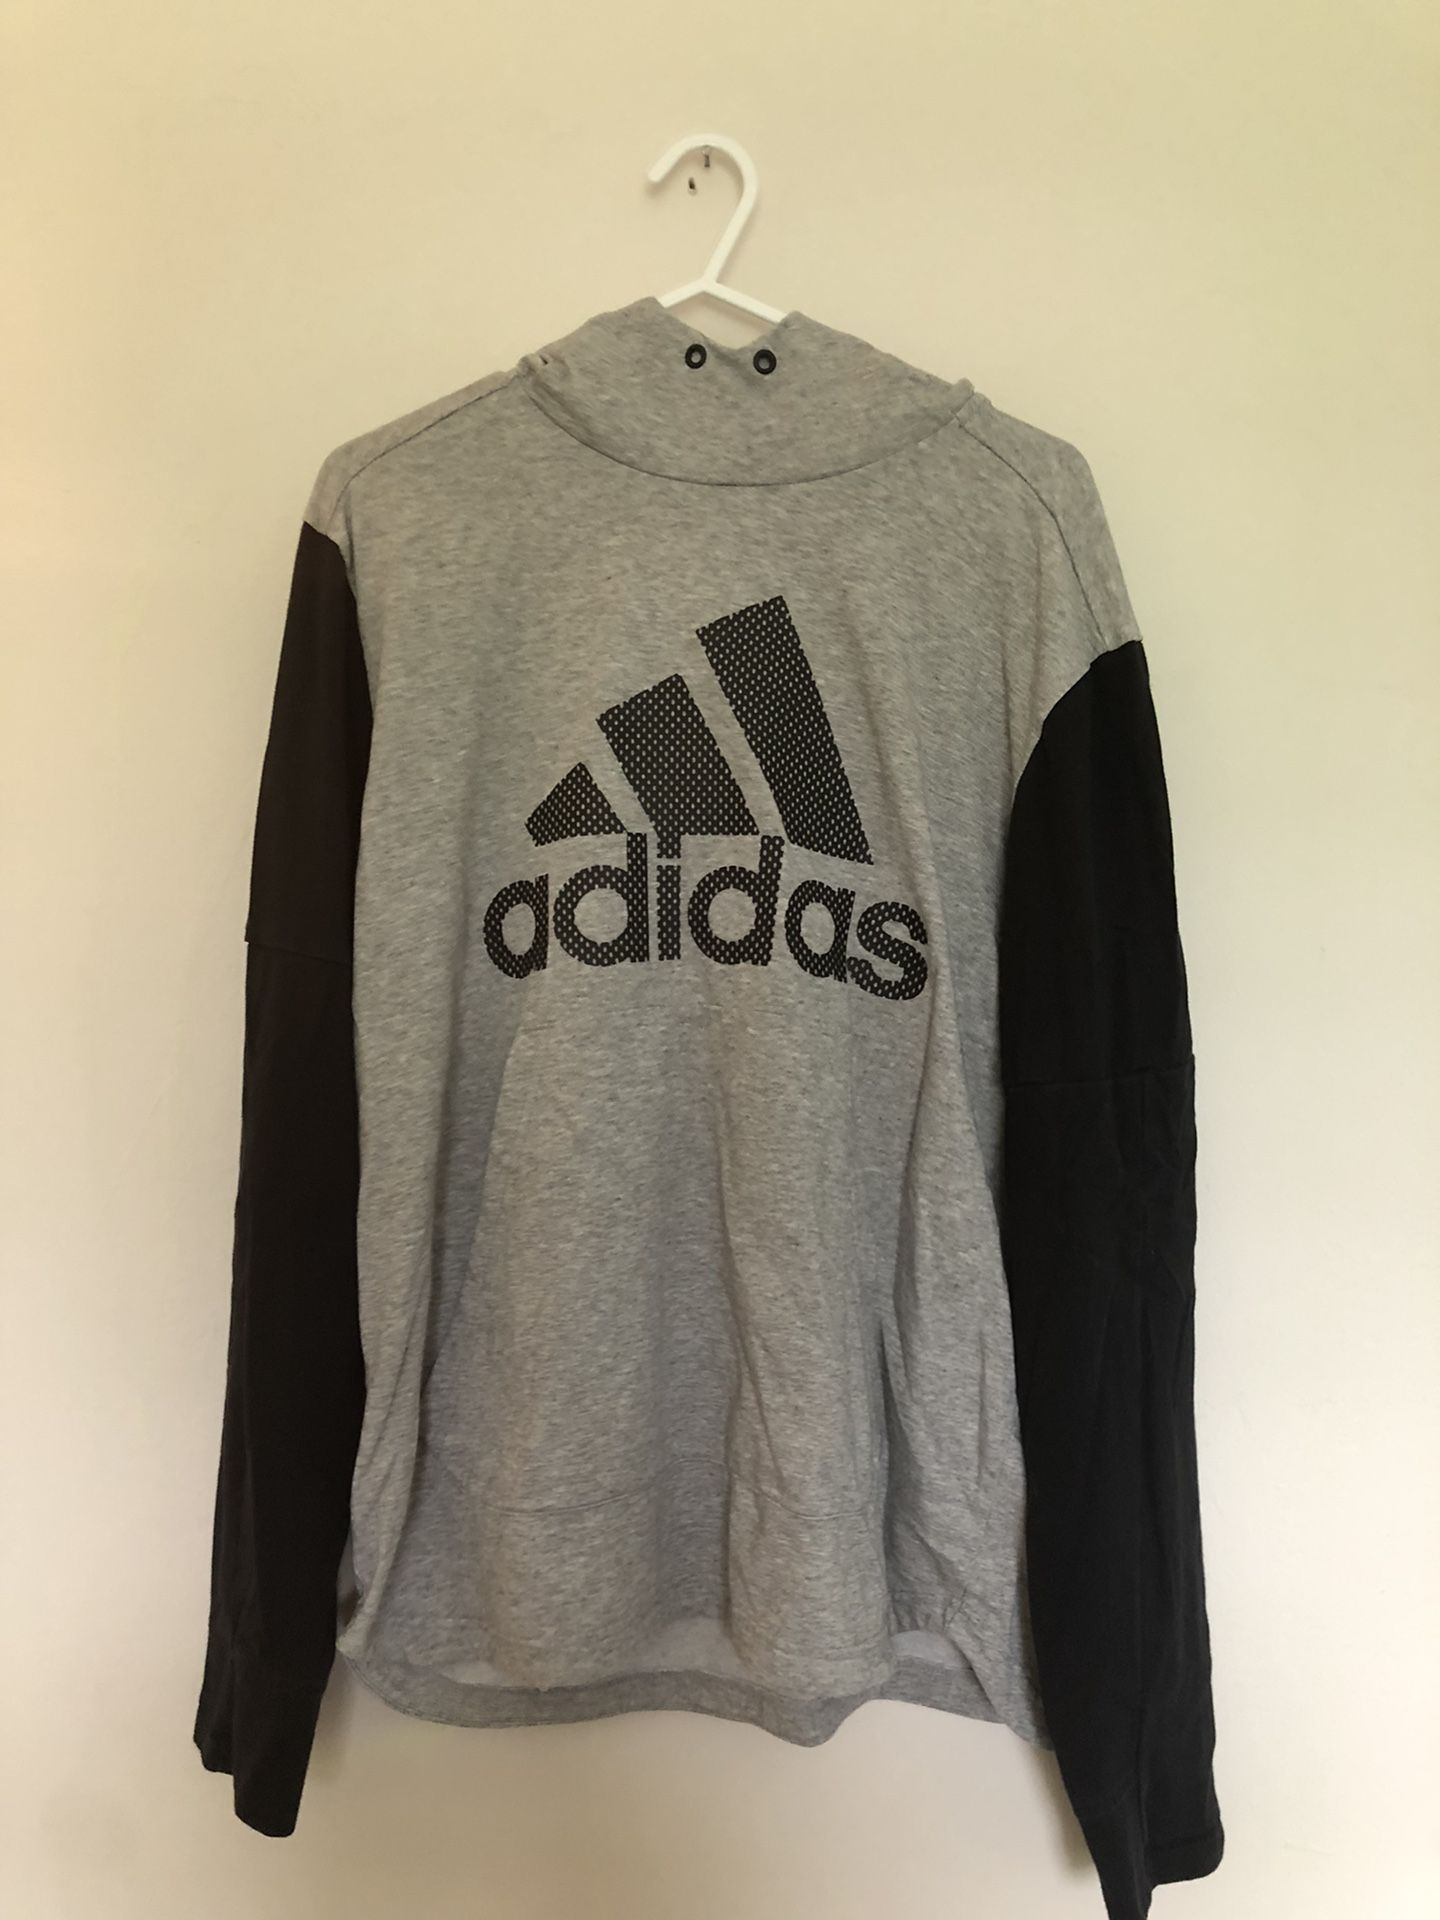 Adidas hooded sweatshirt black and gray size Medium